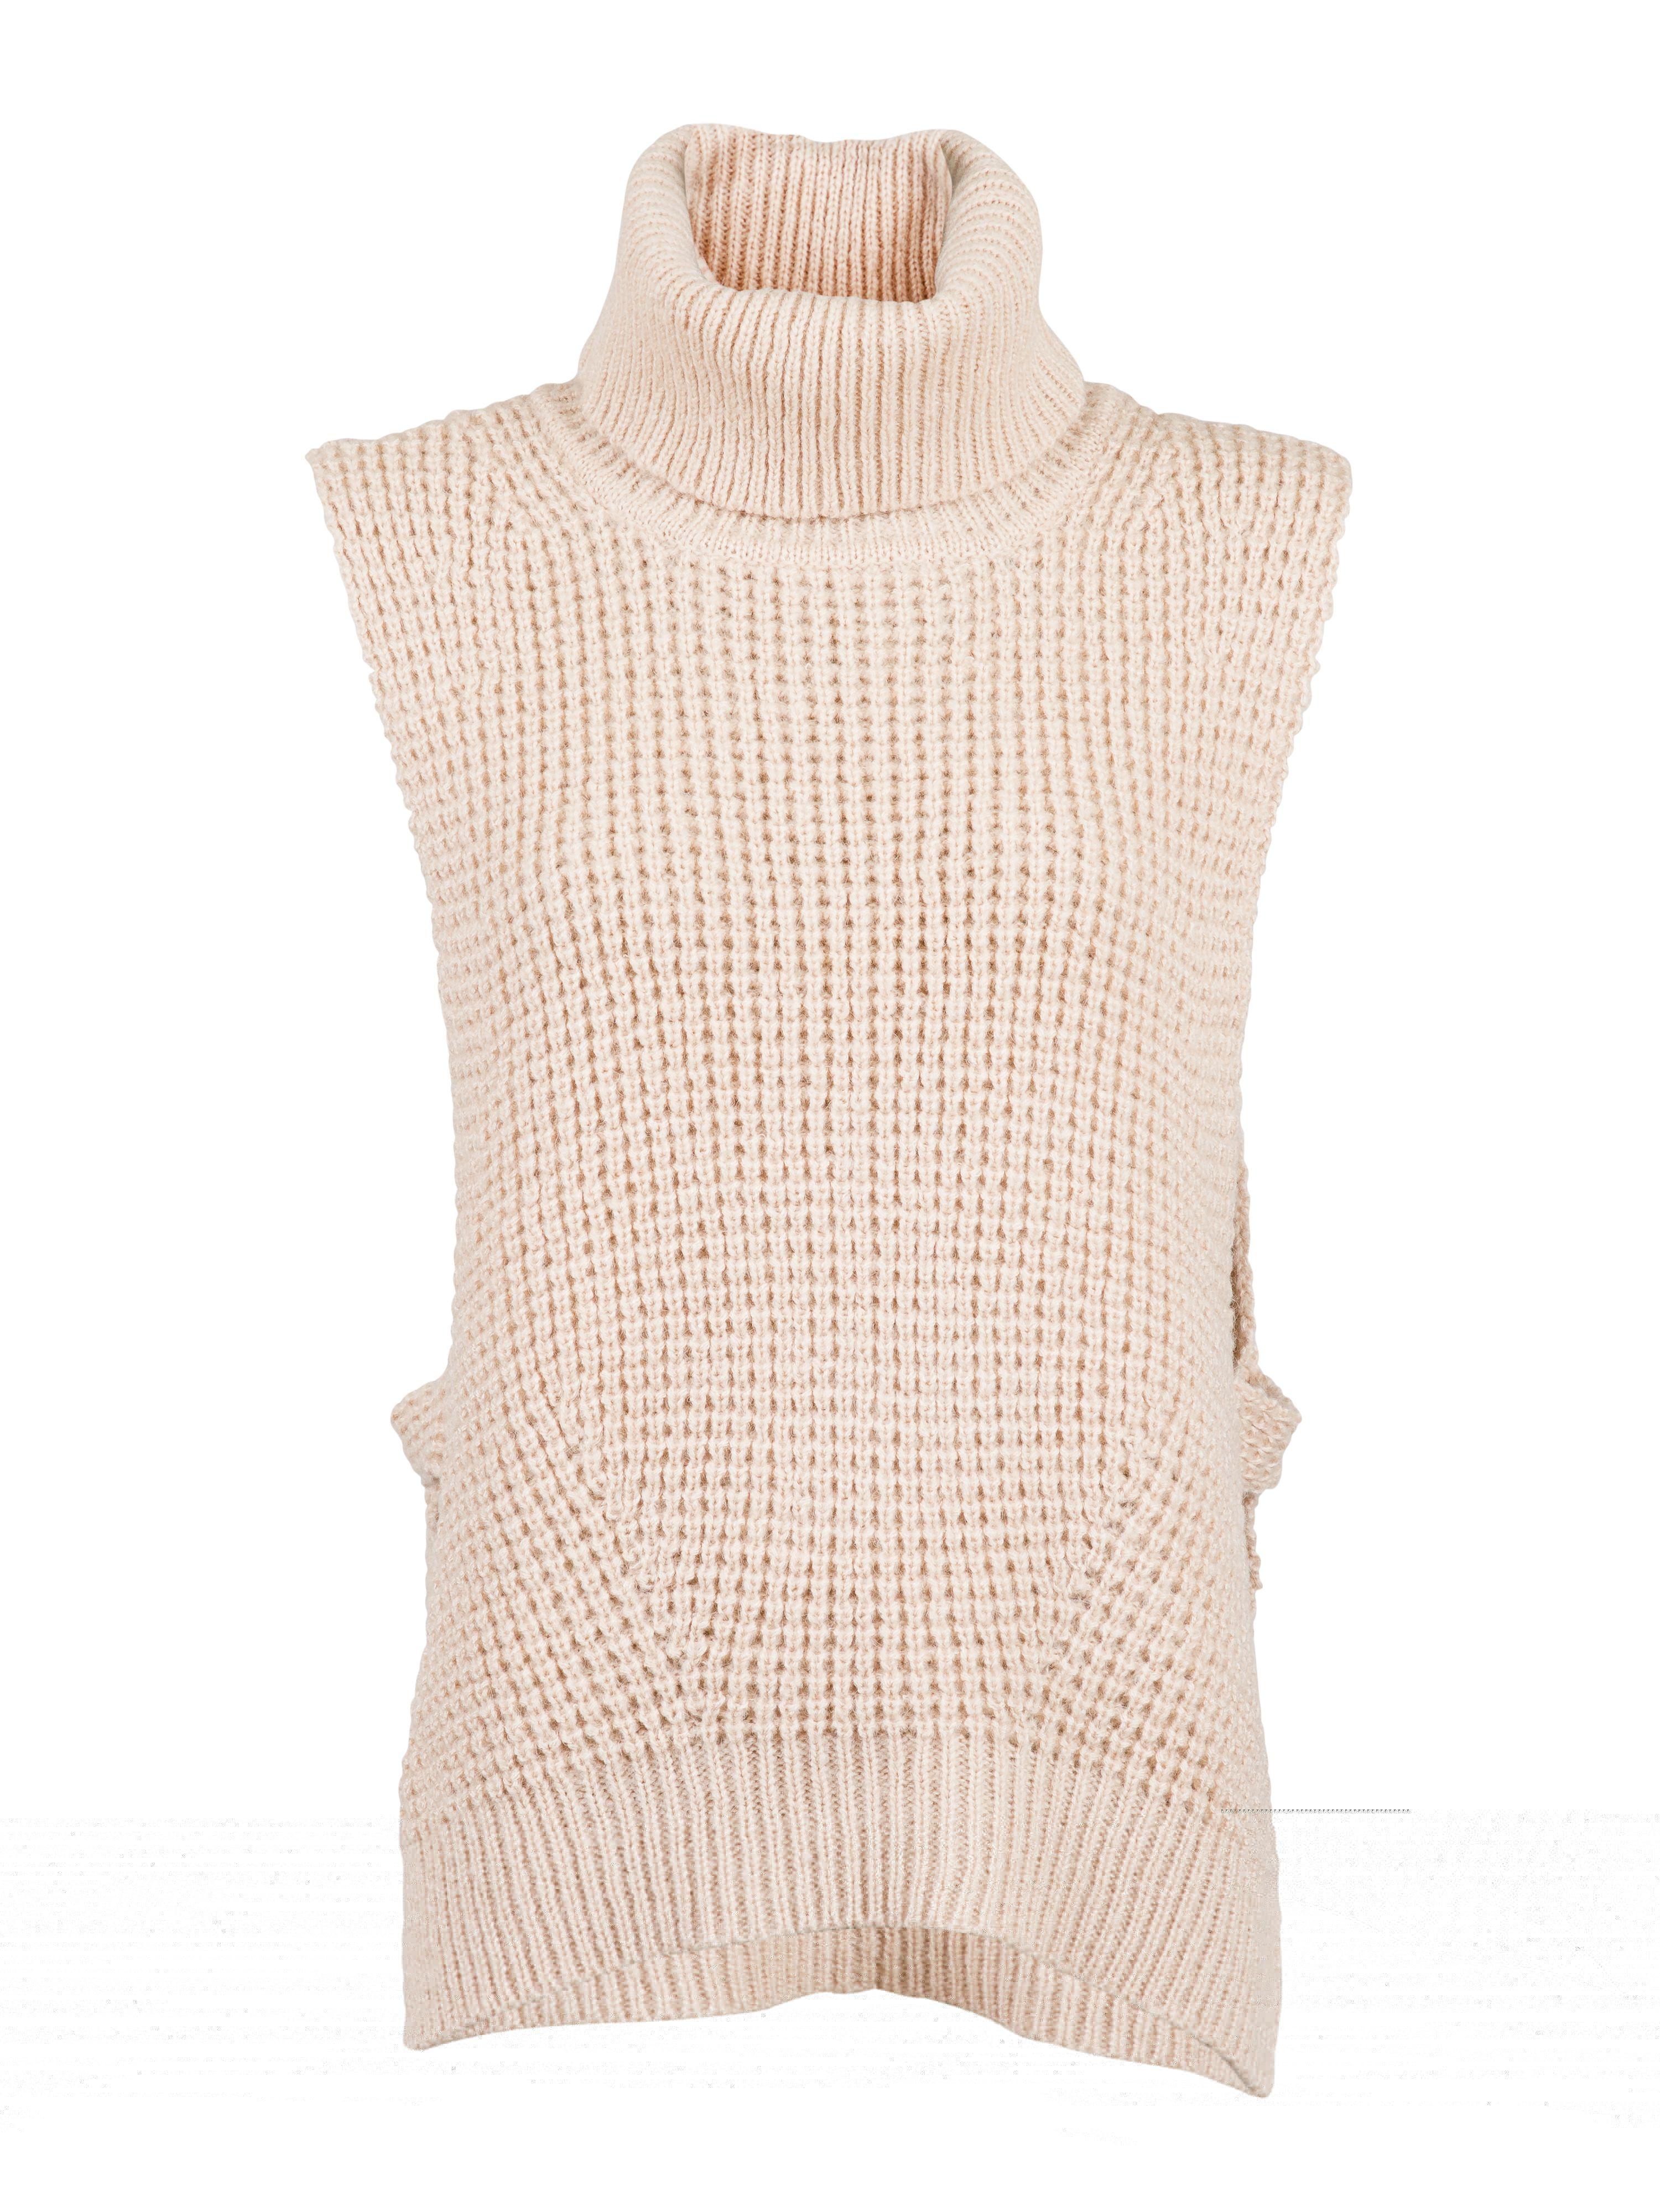 Neo Noir Jamie Knit vest